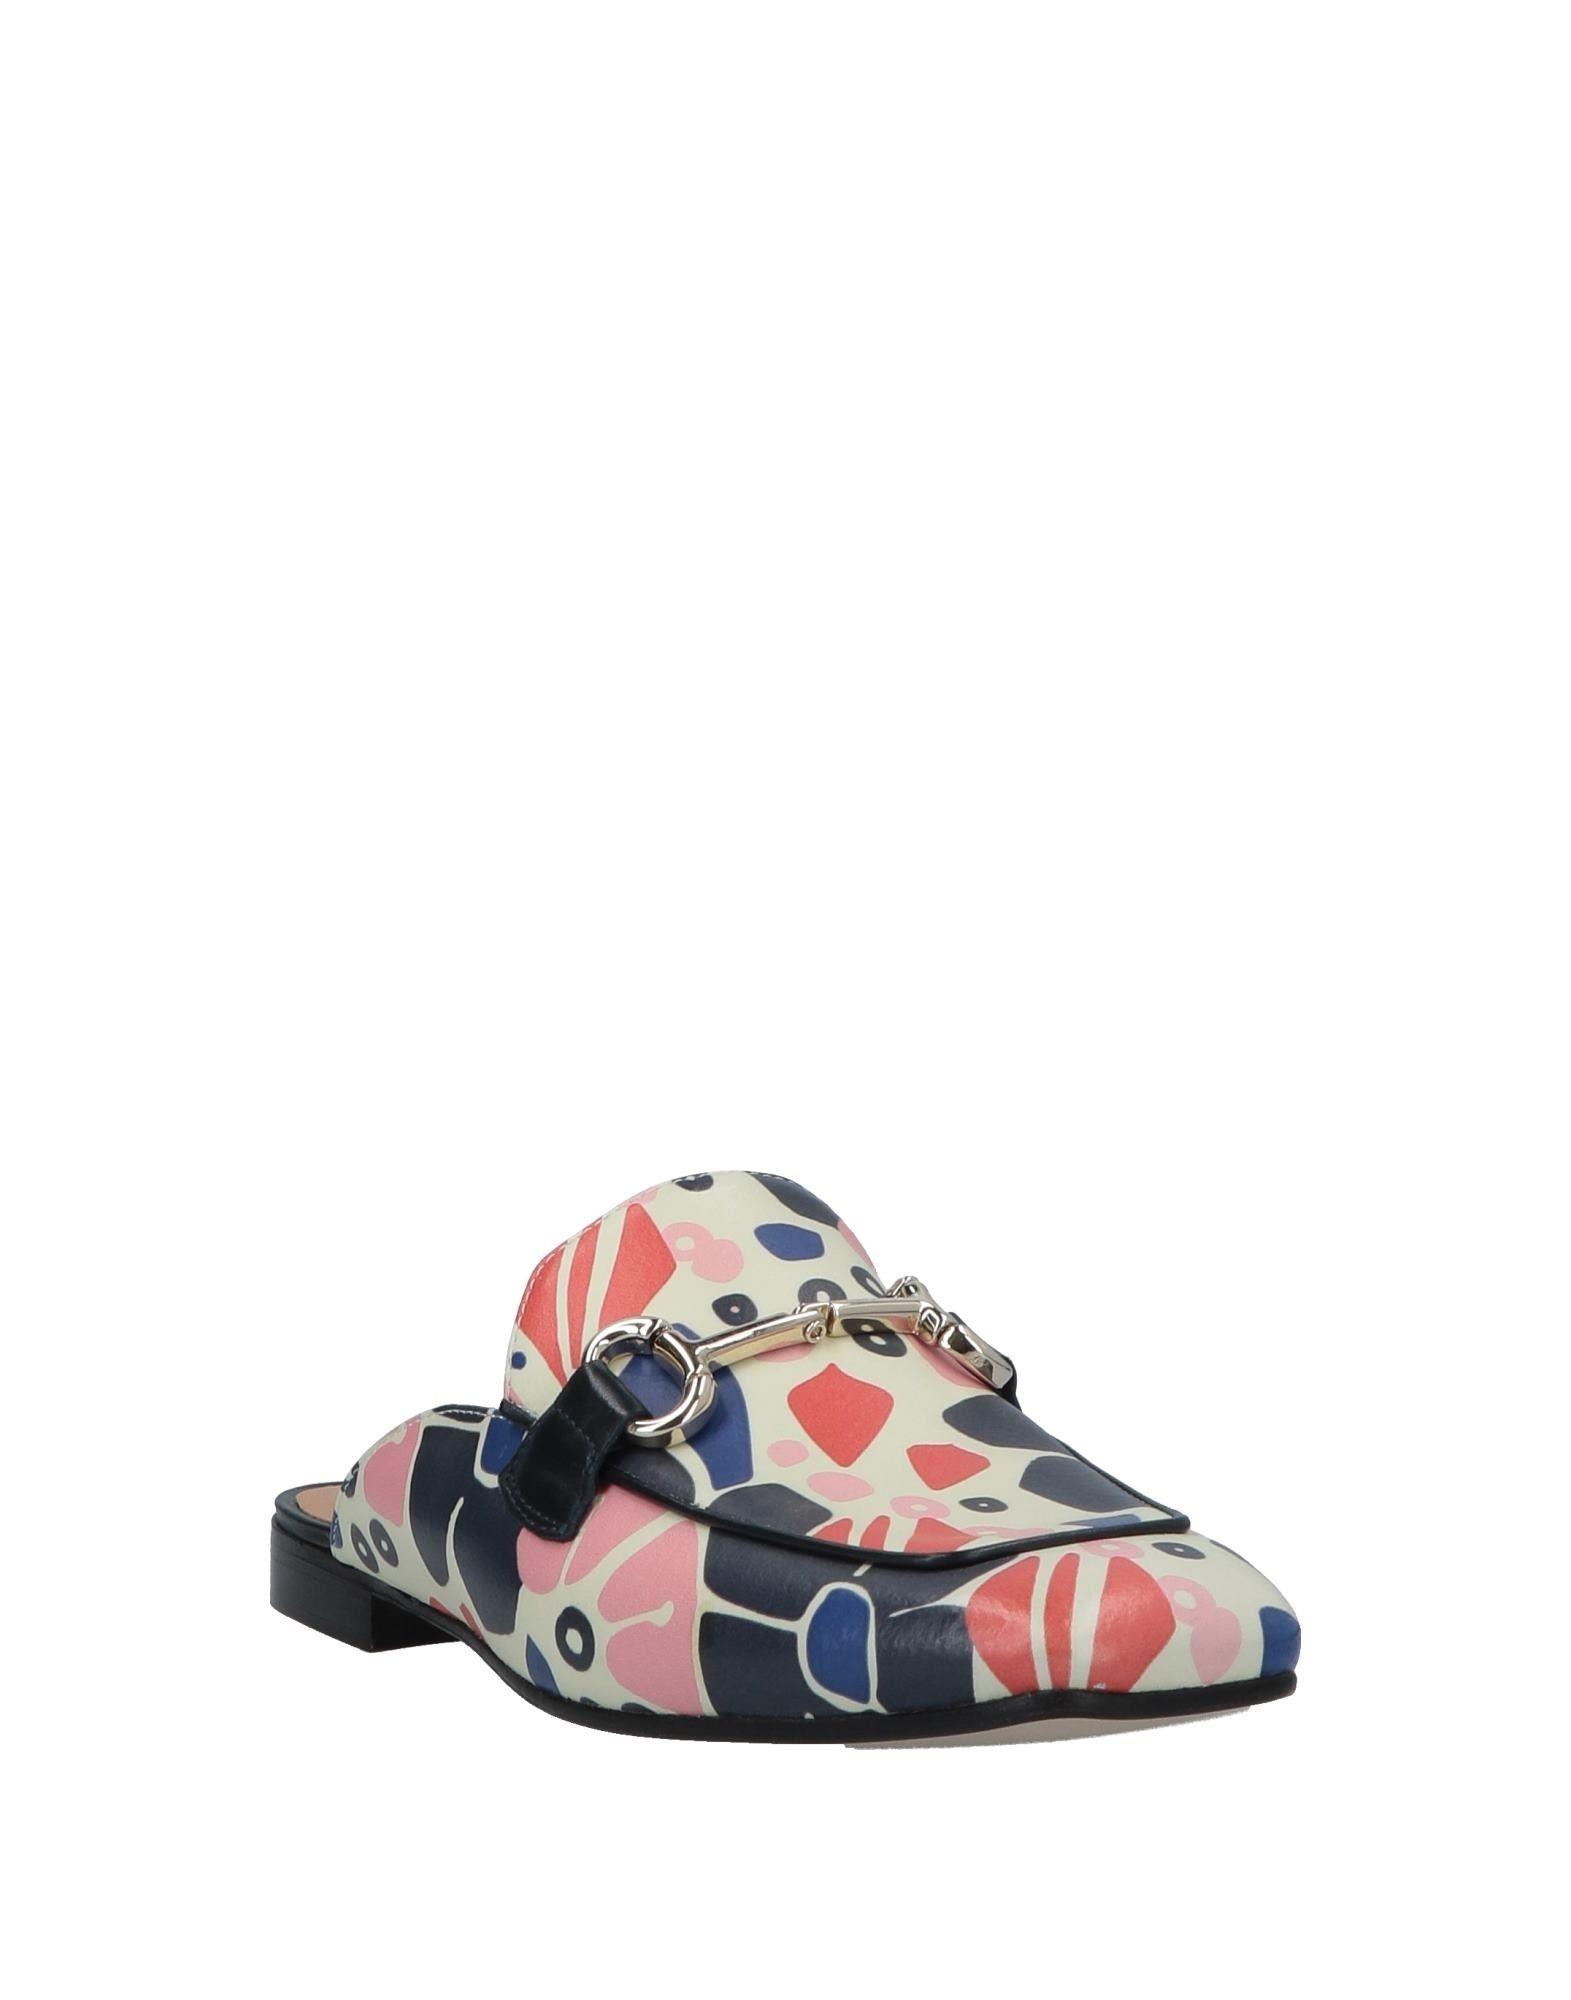 Stilvolle Pantoletten billige Schuhe Mara Bini Pantoletten Stilvolle Damen  11574951NI 15b0a0